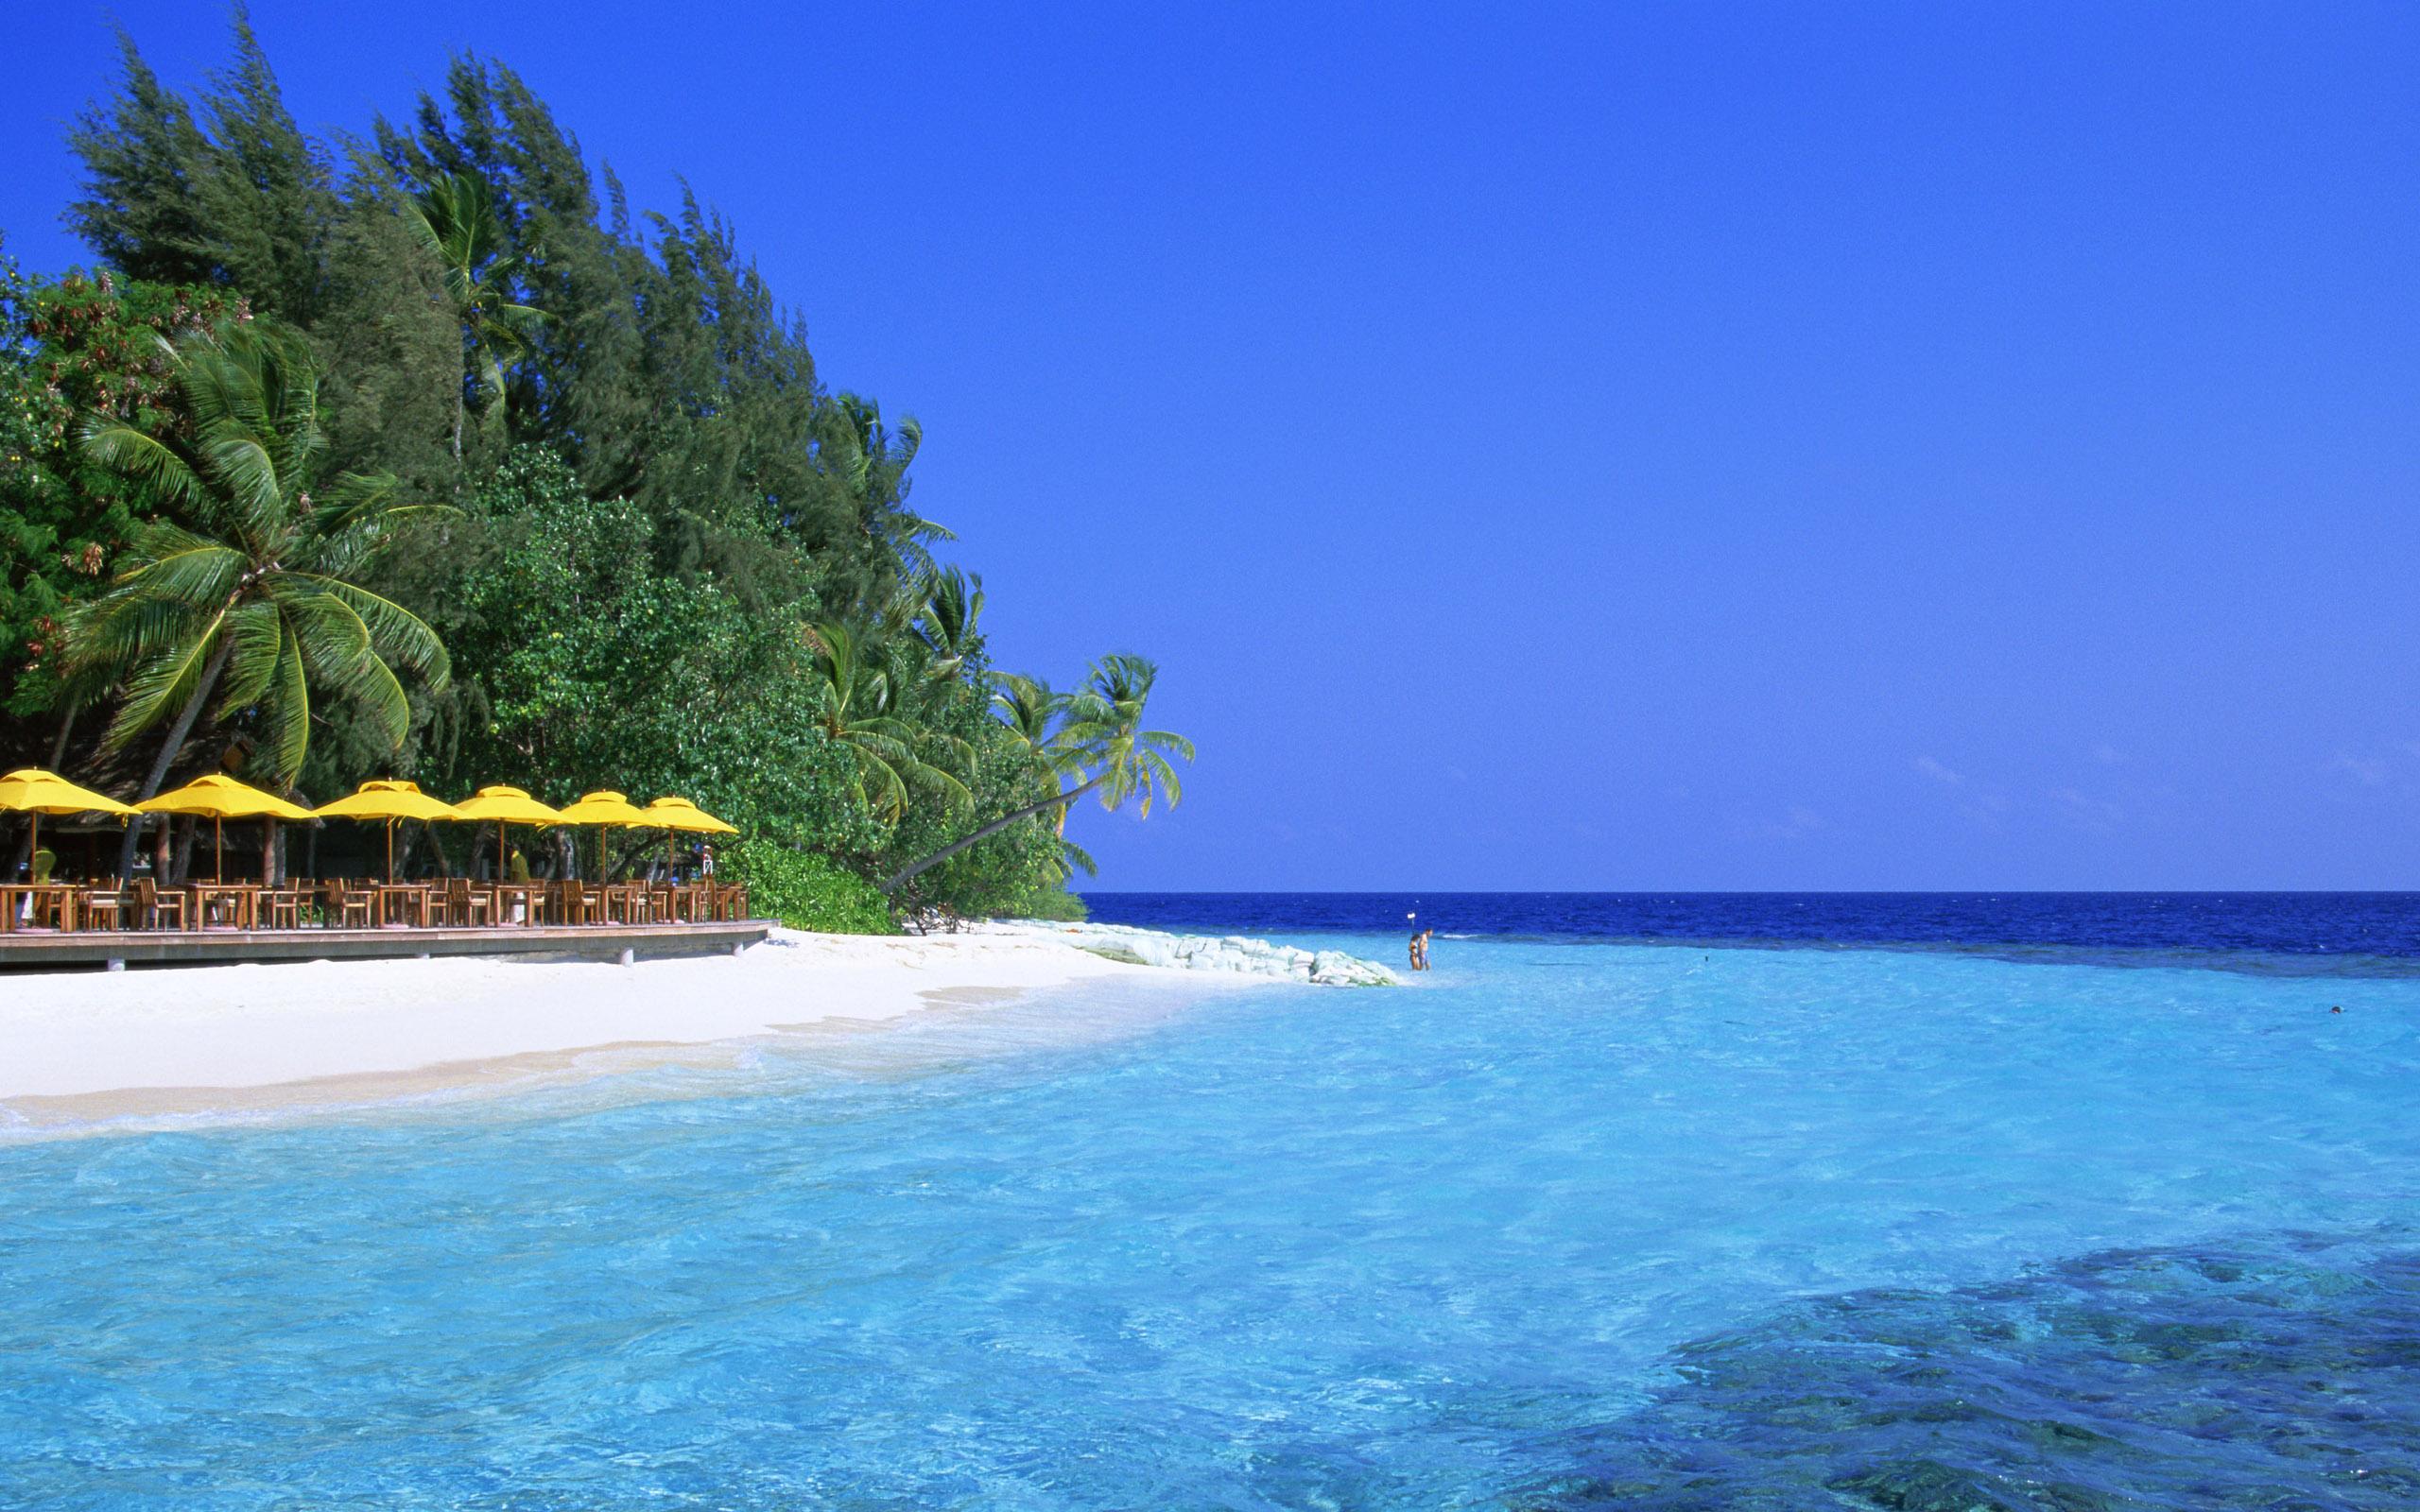 Maldives Paradise Island 2560x1600 HD Wallpapers pack 1   Photo 2 of 2560x1600